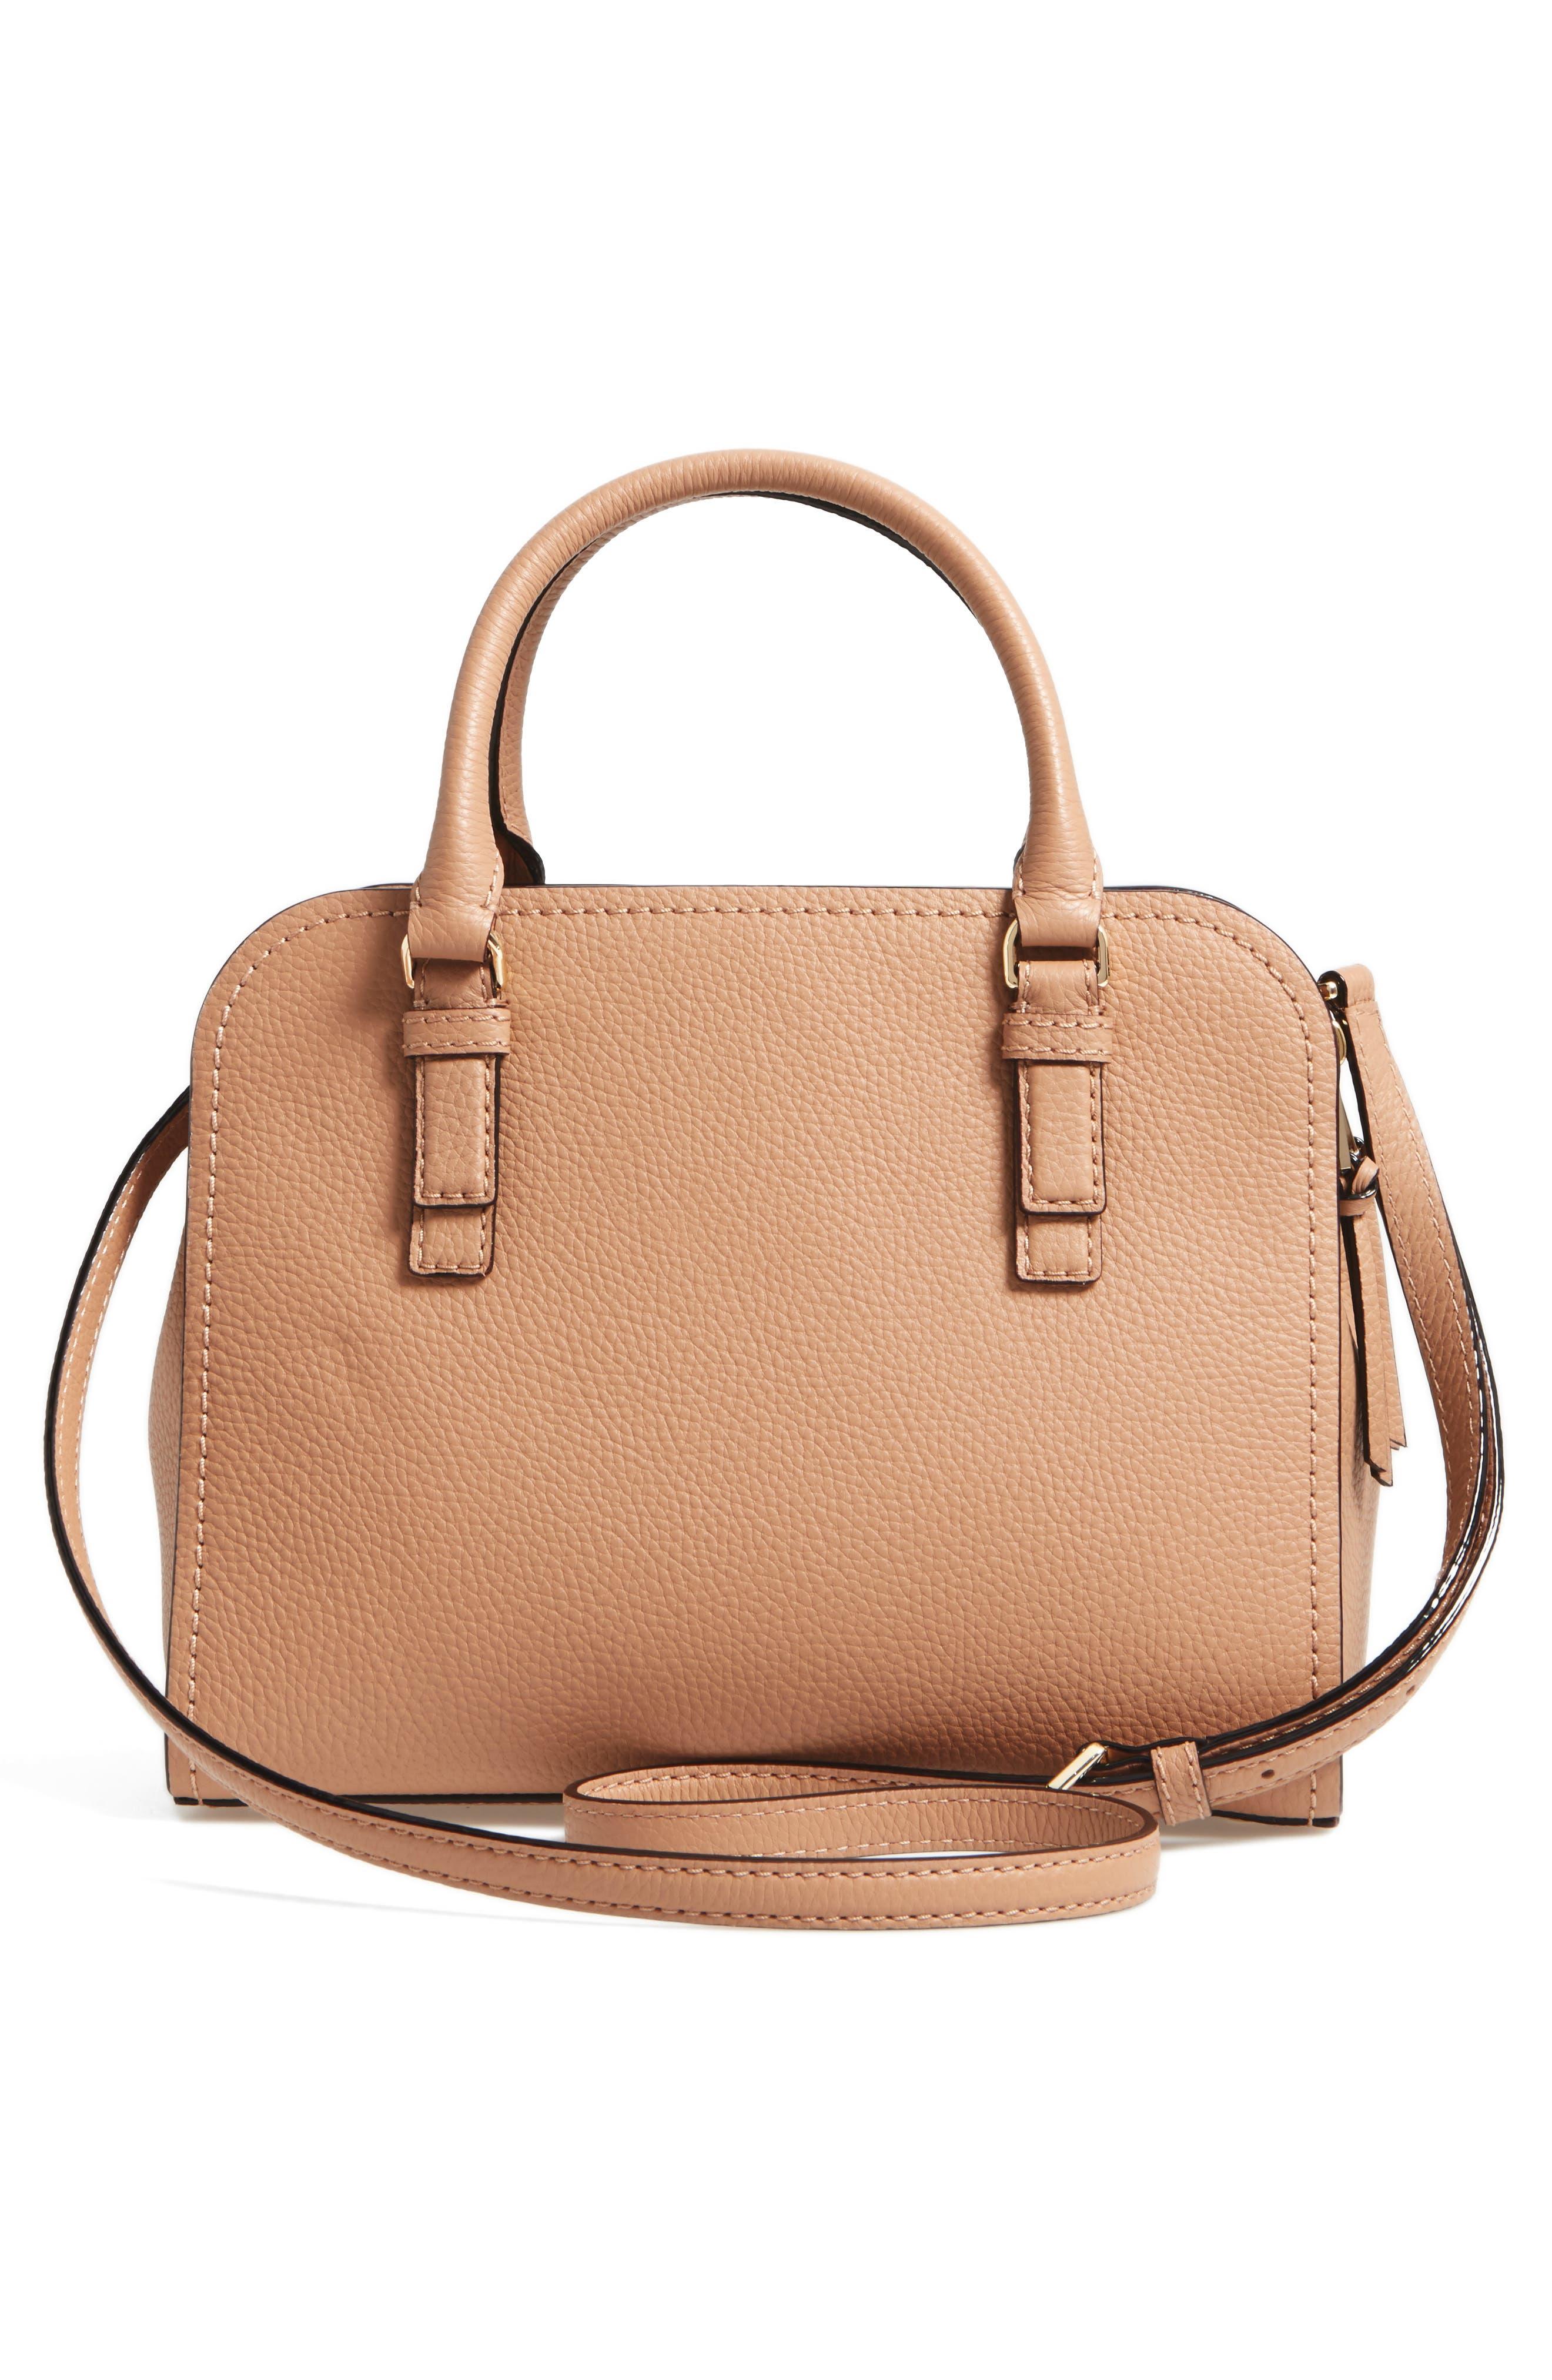 jackson street small kiernan leather top handle satchel,                             Alternate thumbnail 3, color,                             Hazel